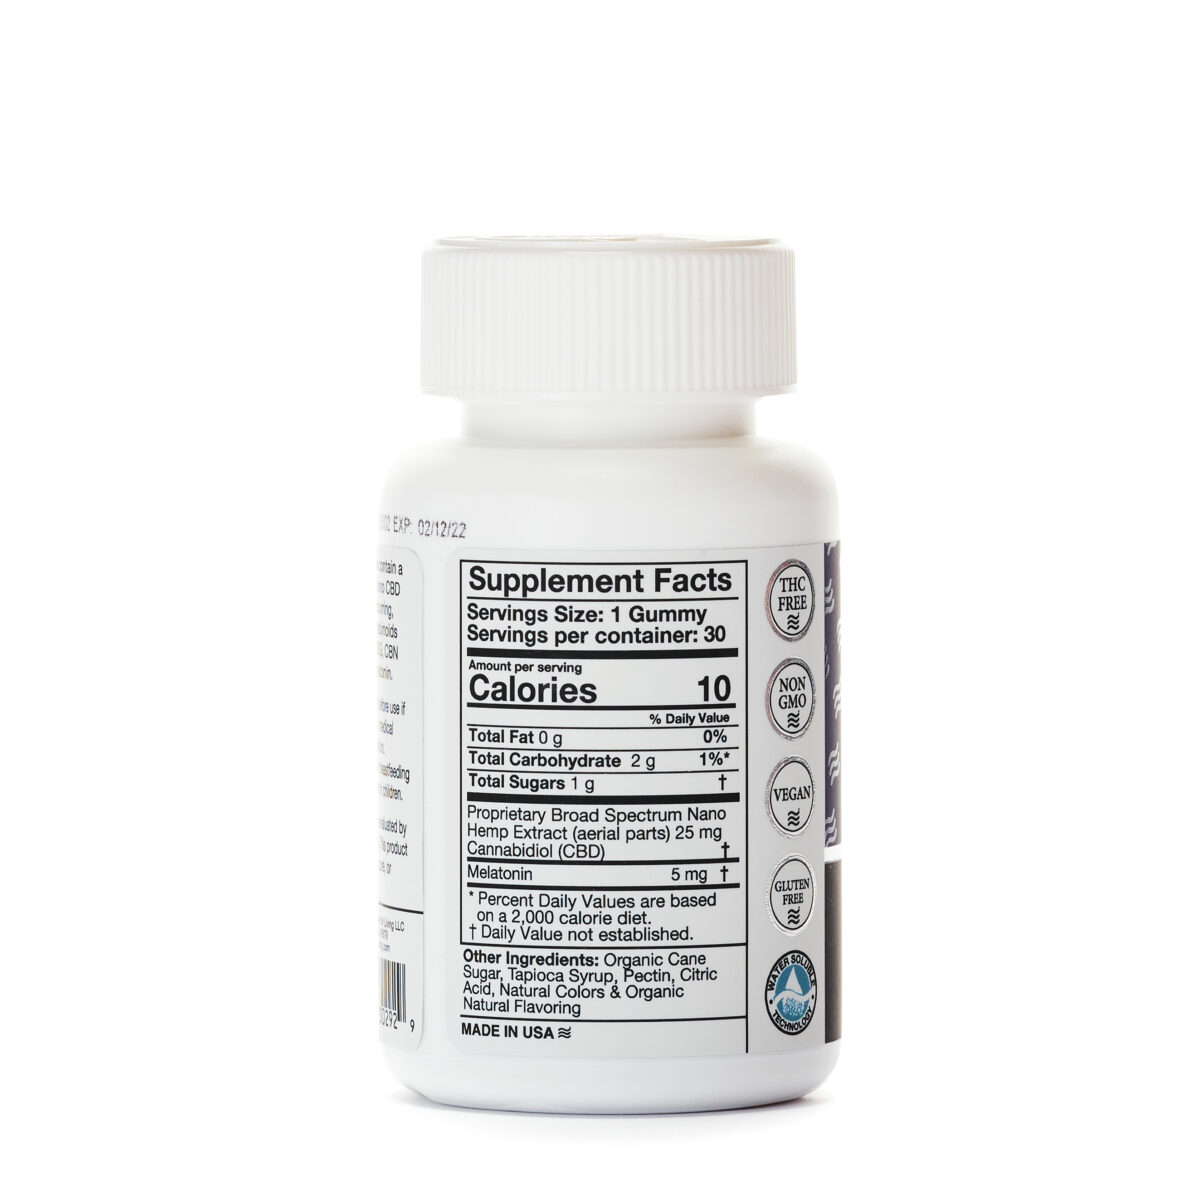 Конфеты CBD, Желейки с КБД для Сна 30 шт., 25мг. CBD и 5мг. Мелатонина в 1 Желе, Gummies – Sleep 750 mg CBD Living, США